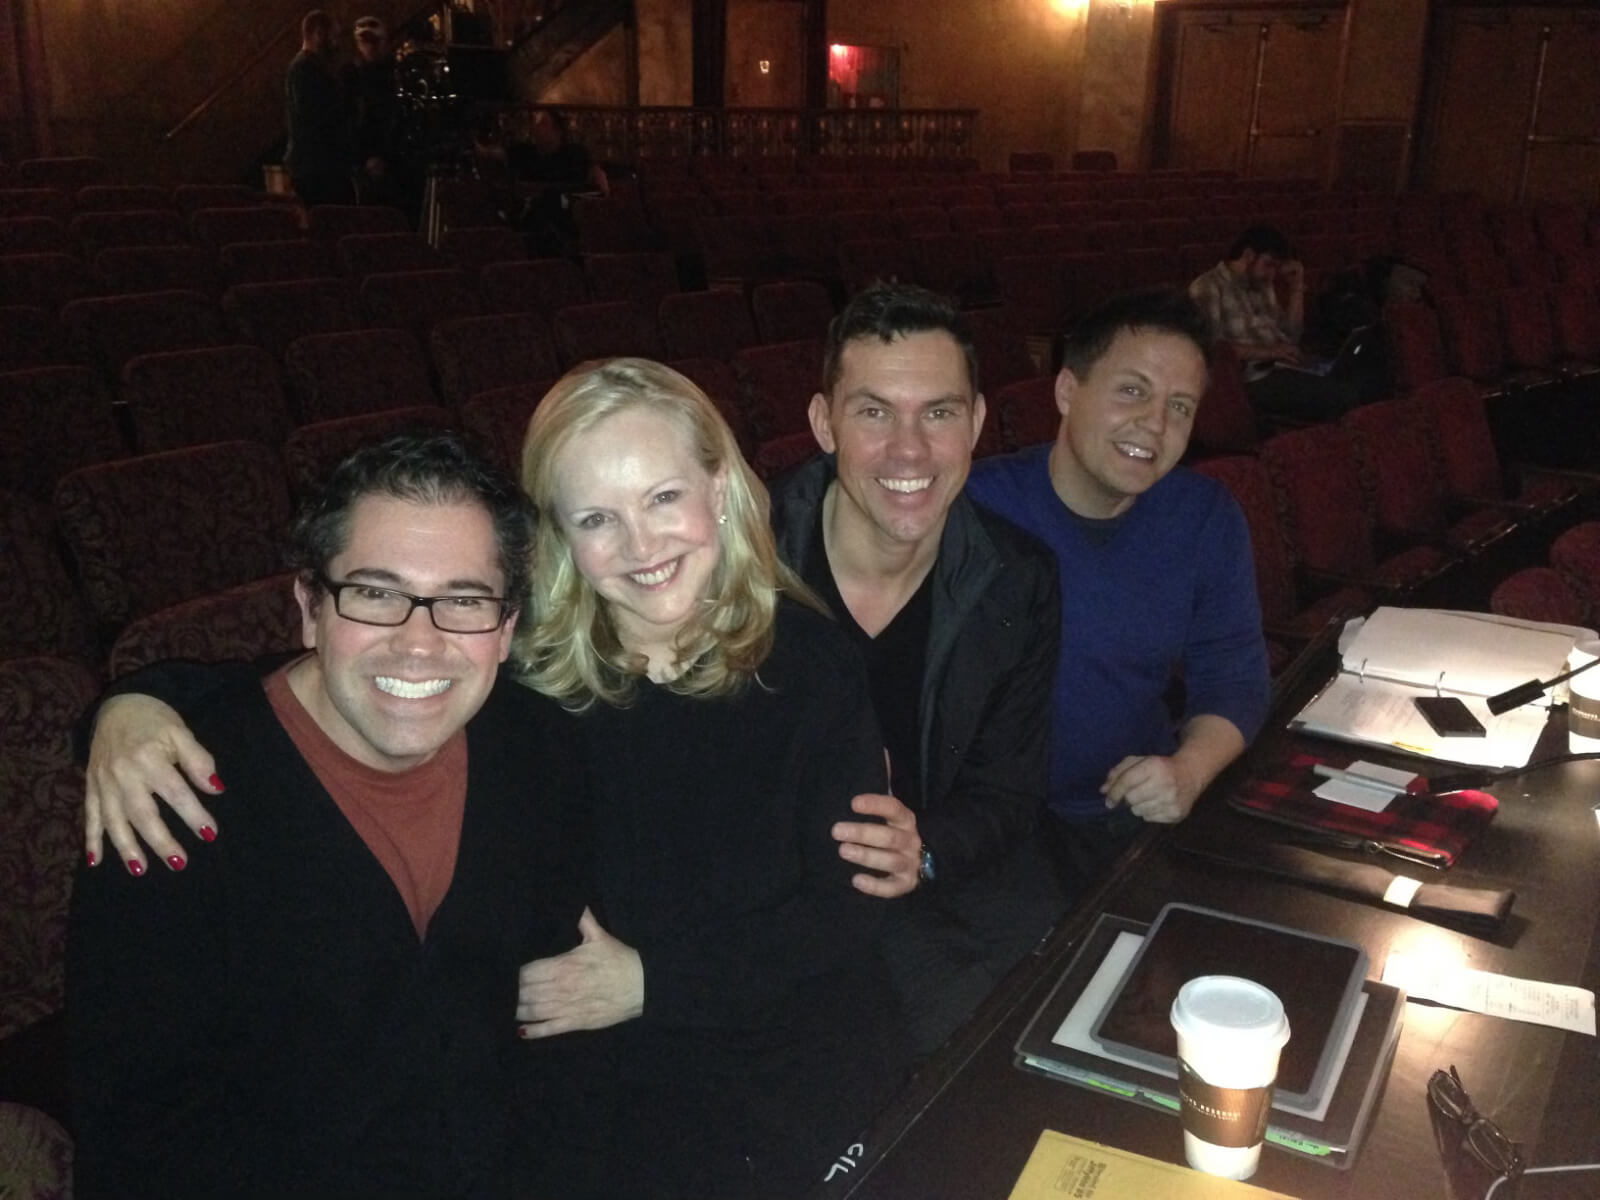 Musical director Andy Einhorn, Susan Stroman, associate choreographer James Gray, associate director Jeff Whiting